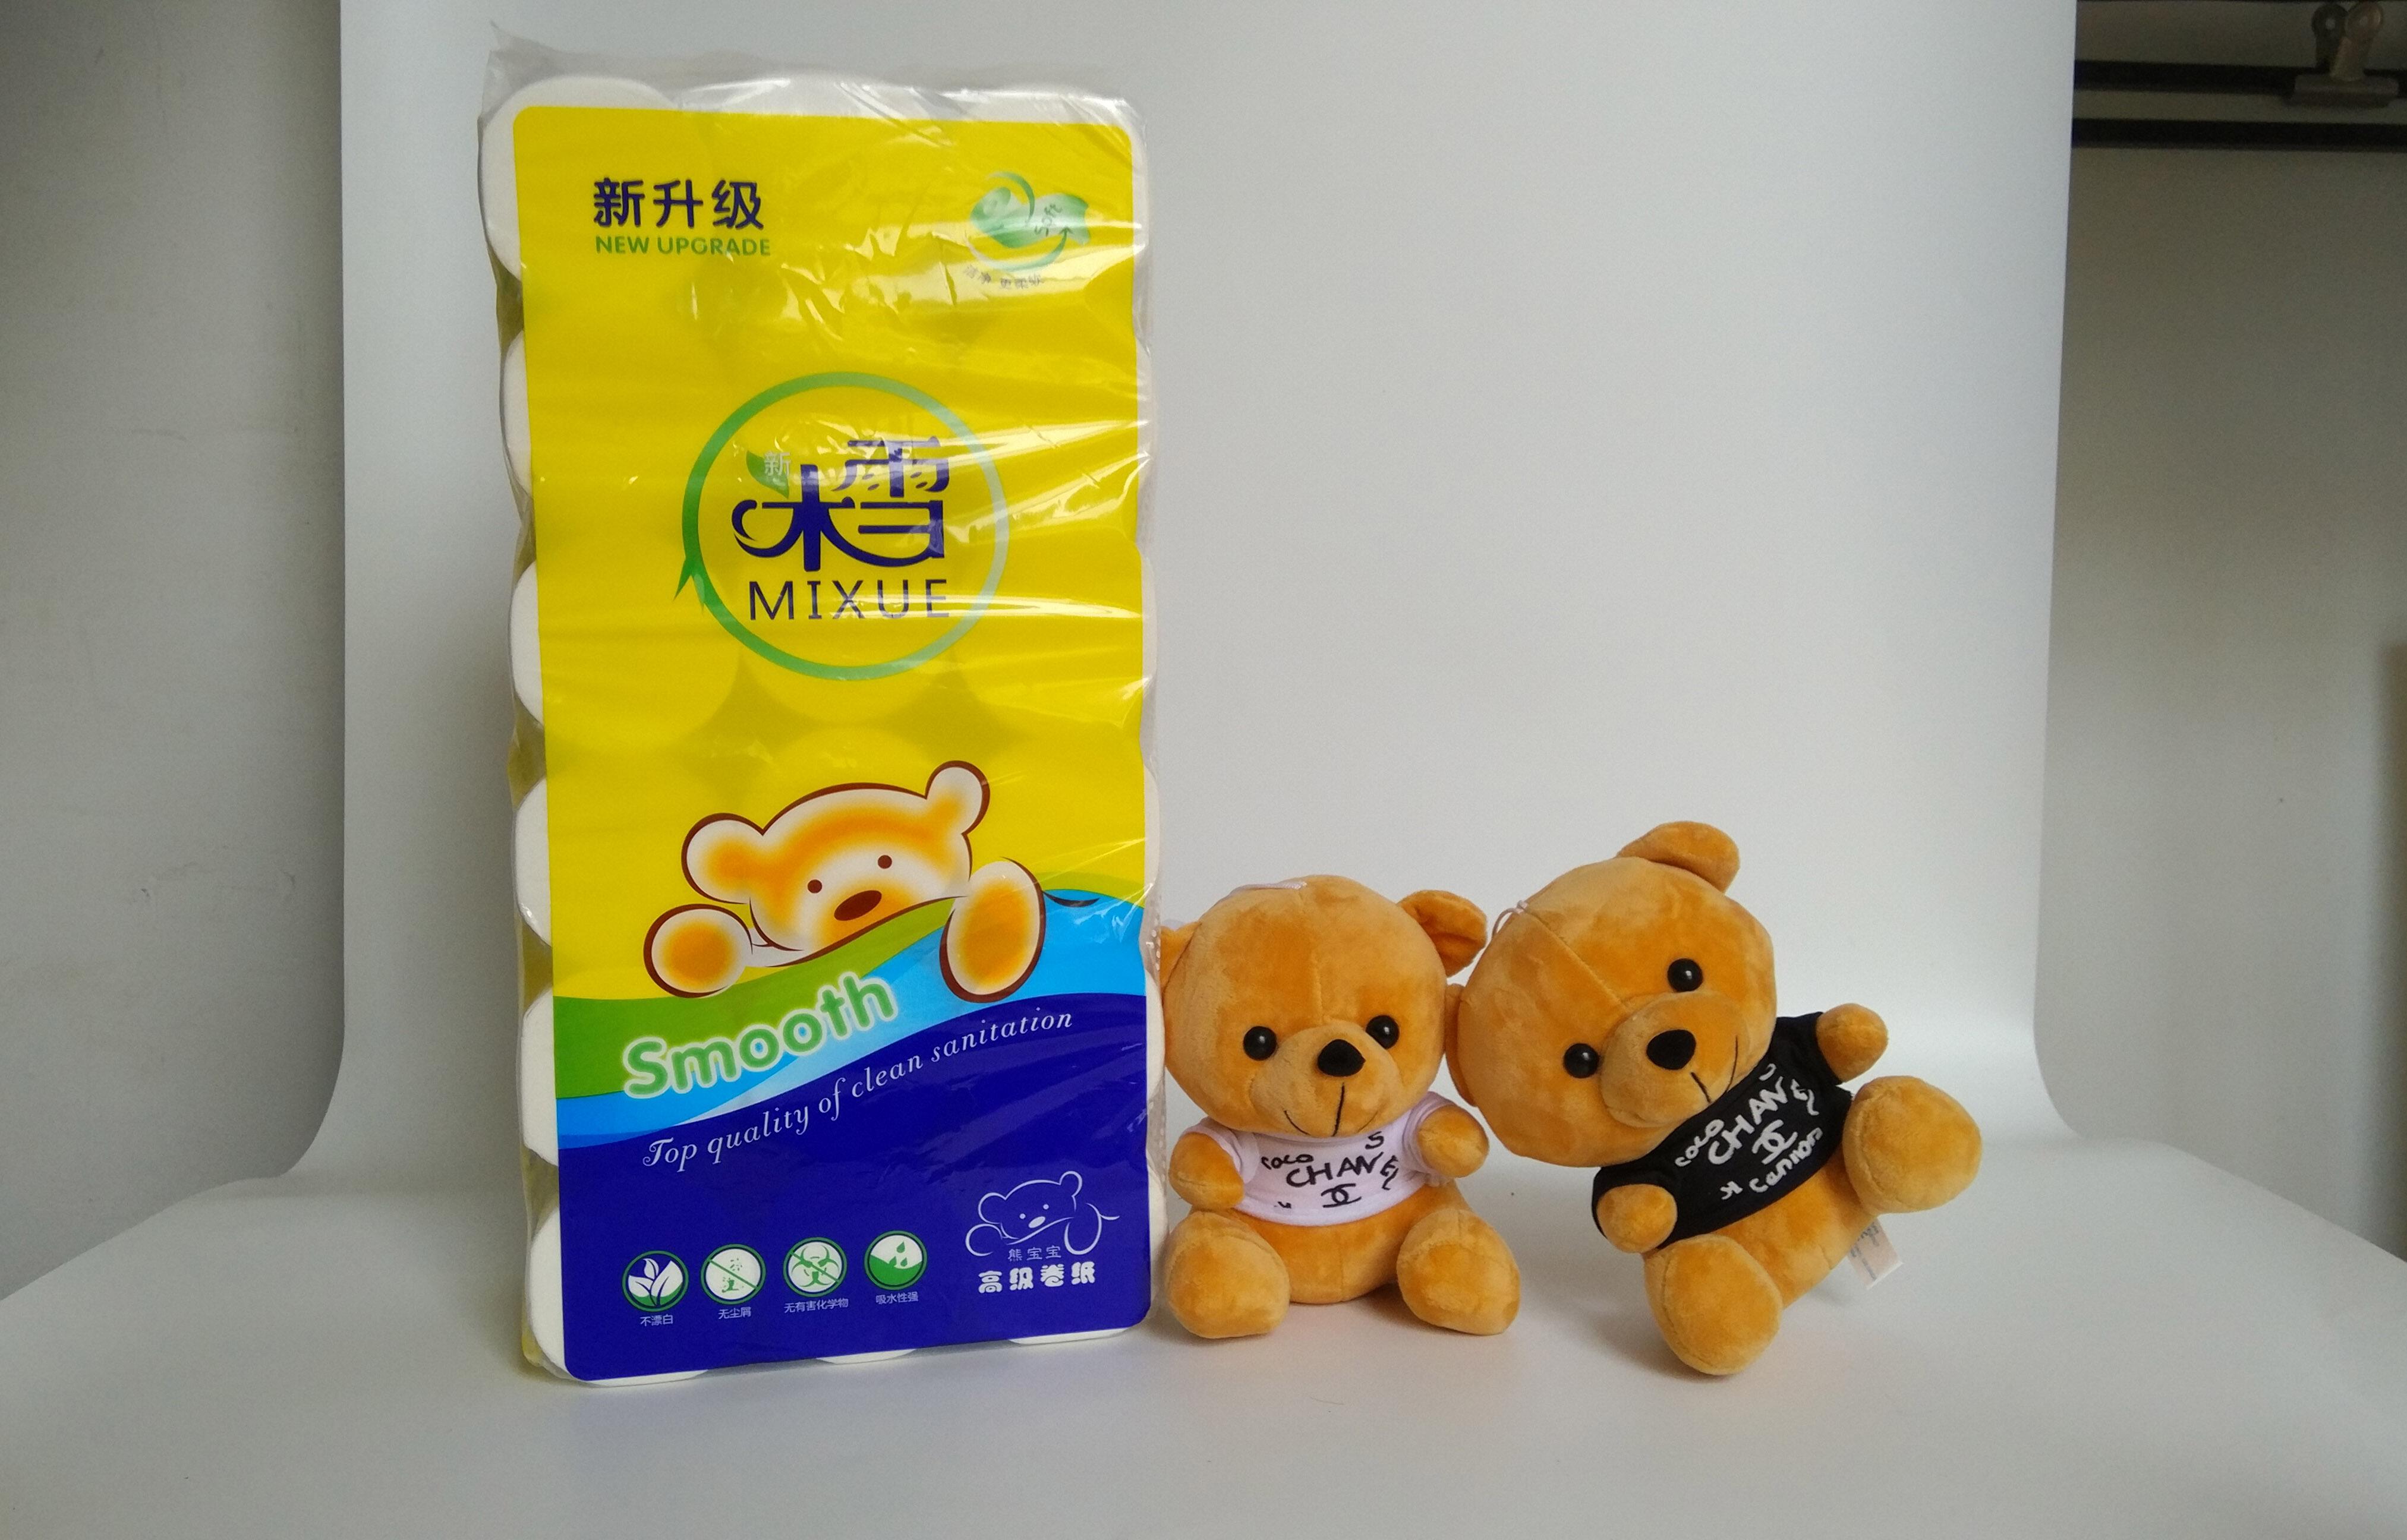 2000g米雪宝宝熊长条实芯卷纸18卷